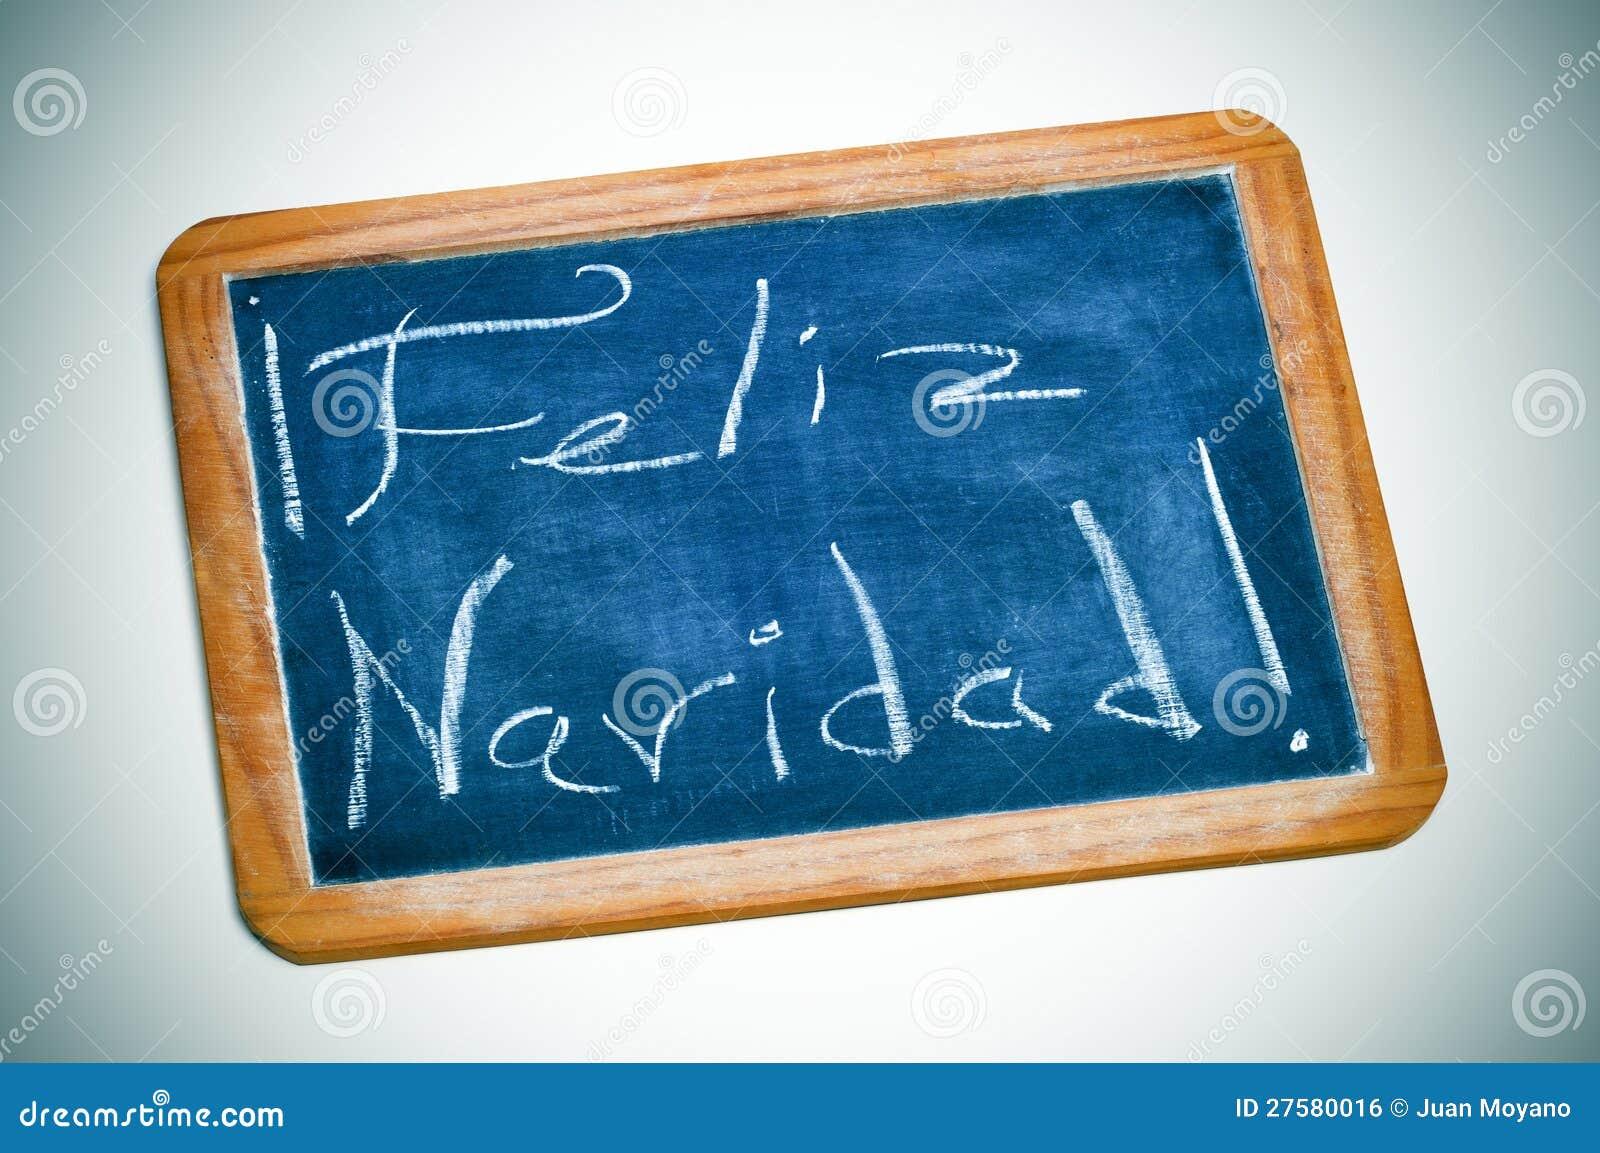 feliz navidad frohe weihnachten auf spanisch stockfoto. Black Bedroom Furniture Sets. Home Design Ideas